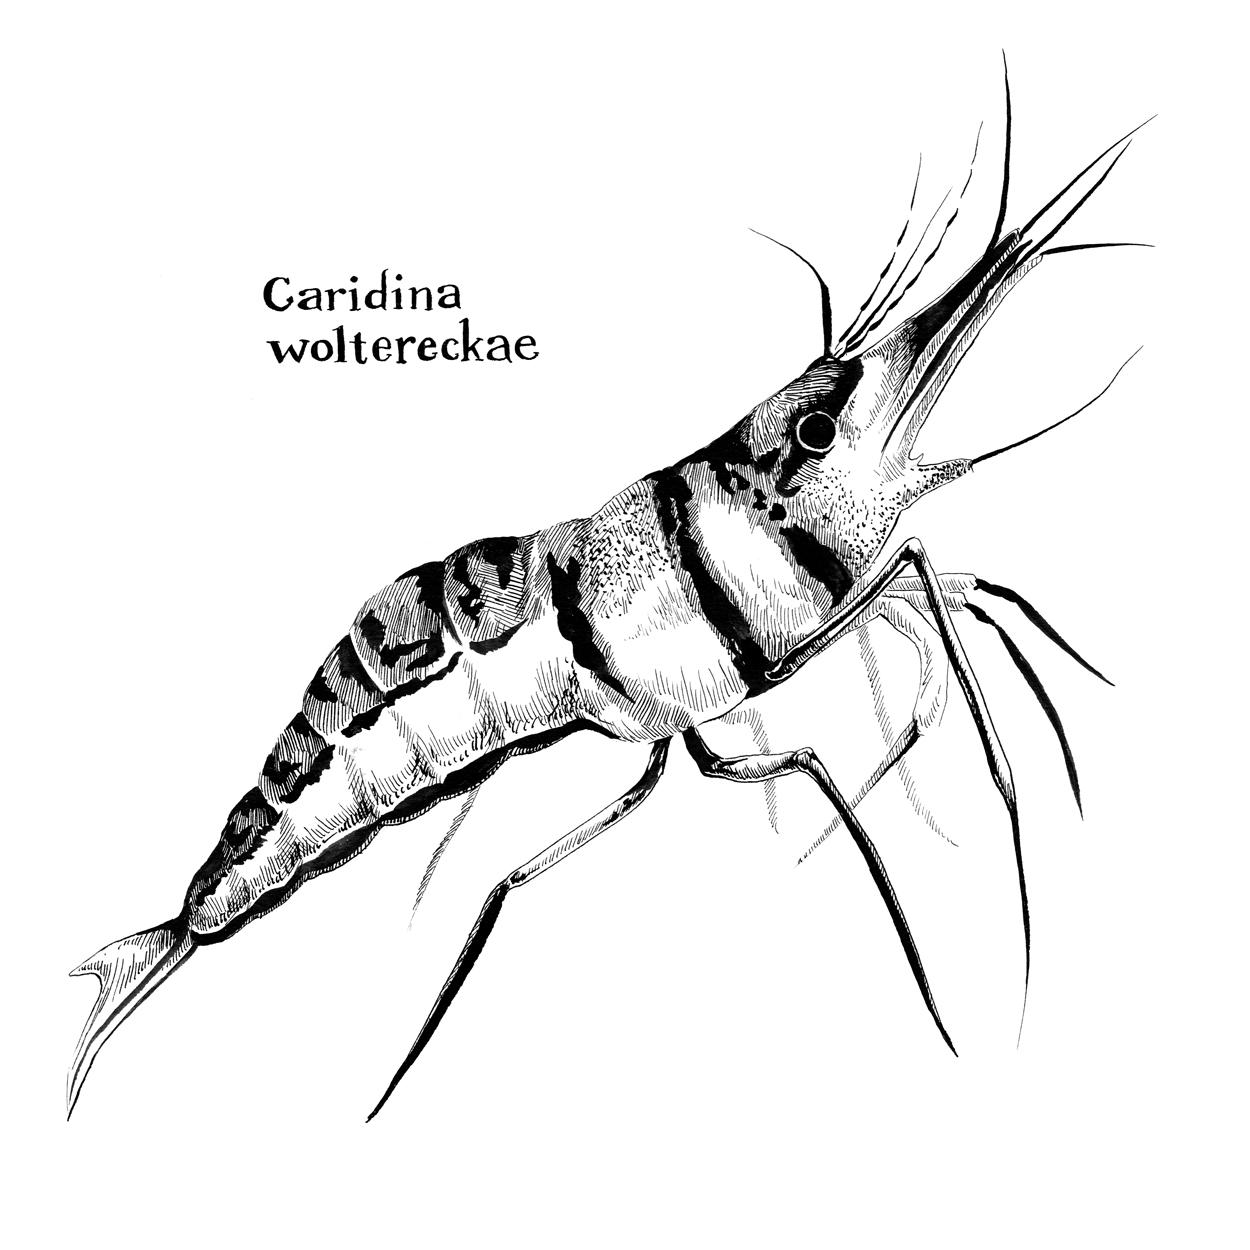 Caridina-woltereckae_Shrimp.jpg